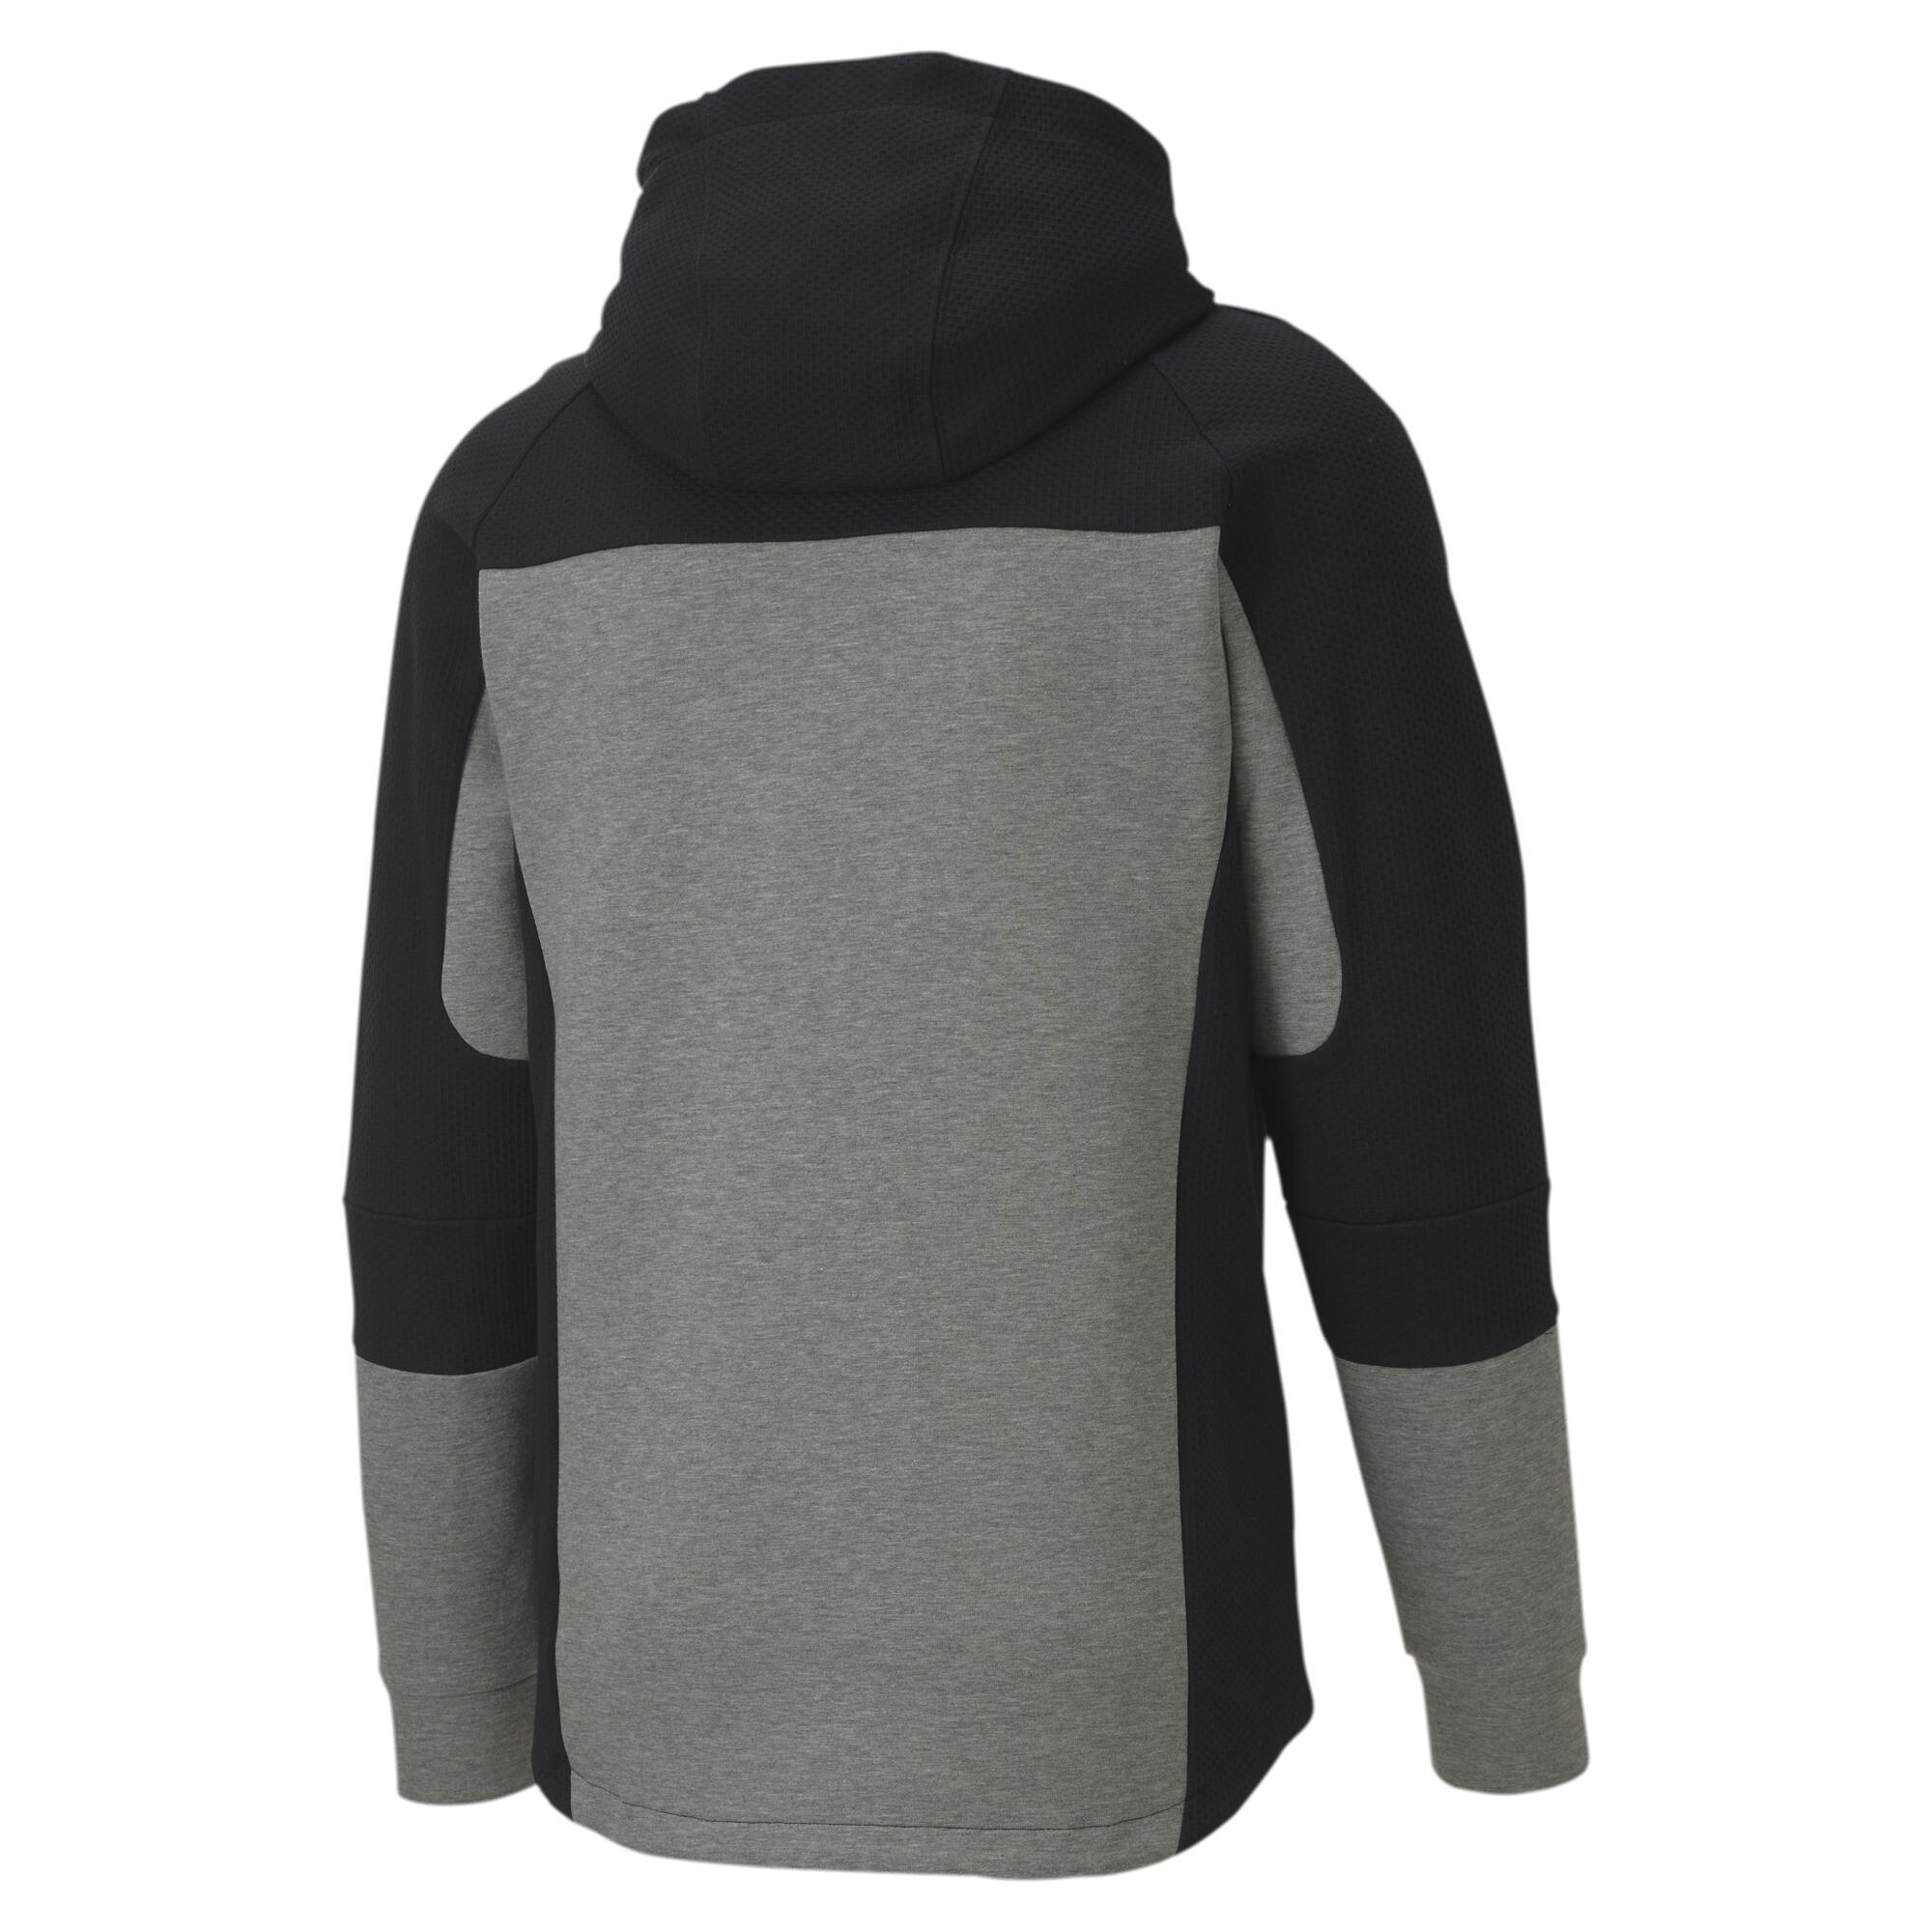 PUMA-Evostripe-Men-039-s-Hooded-Jacket-Men-Sweat-Basics thumbnail 18